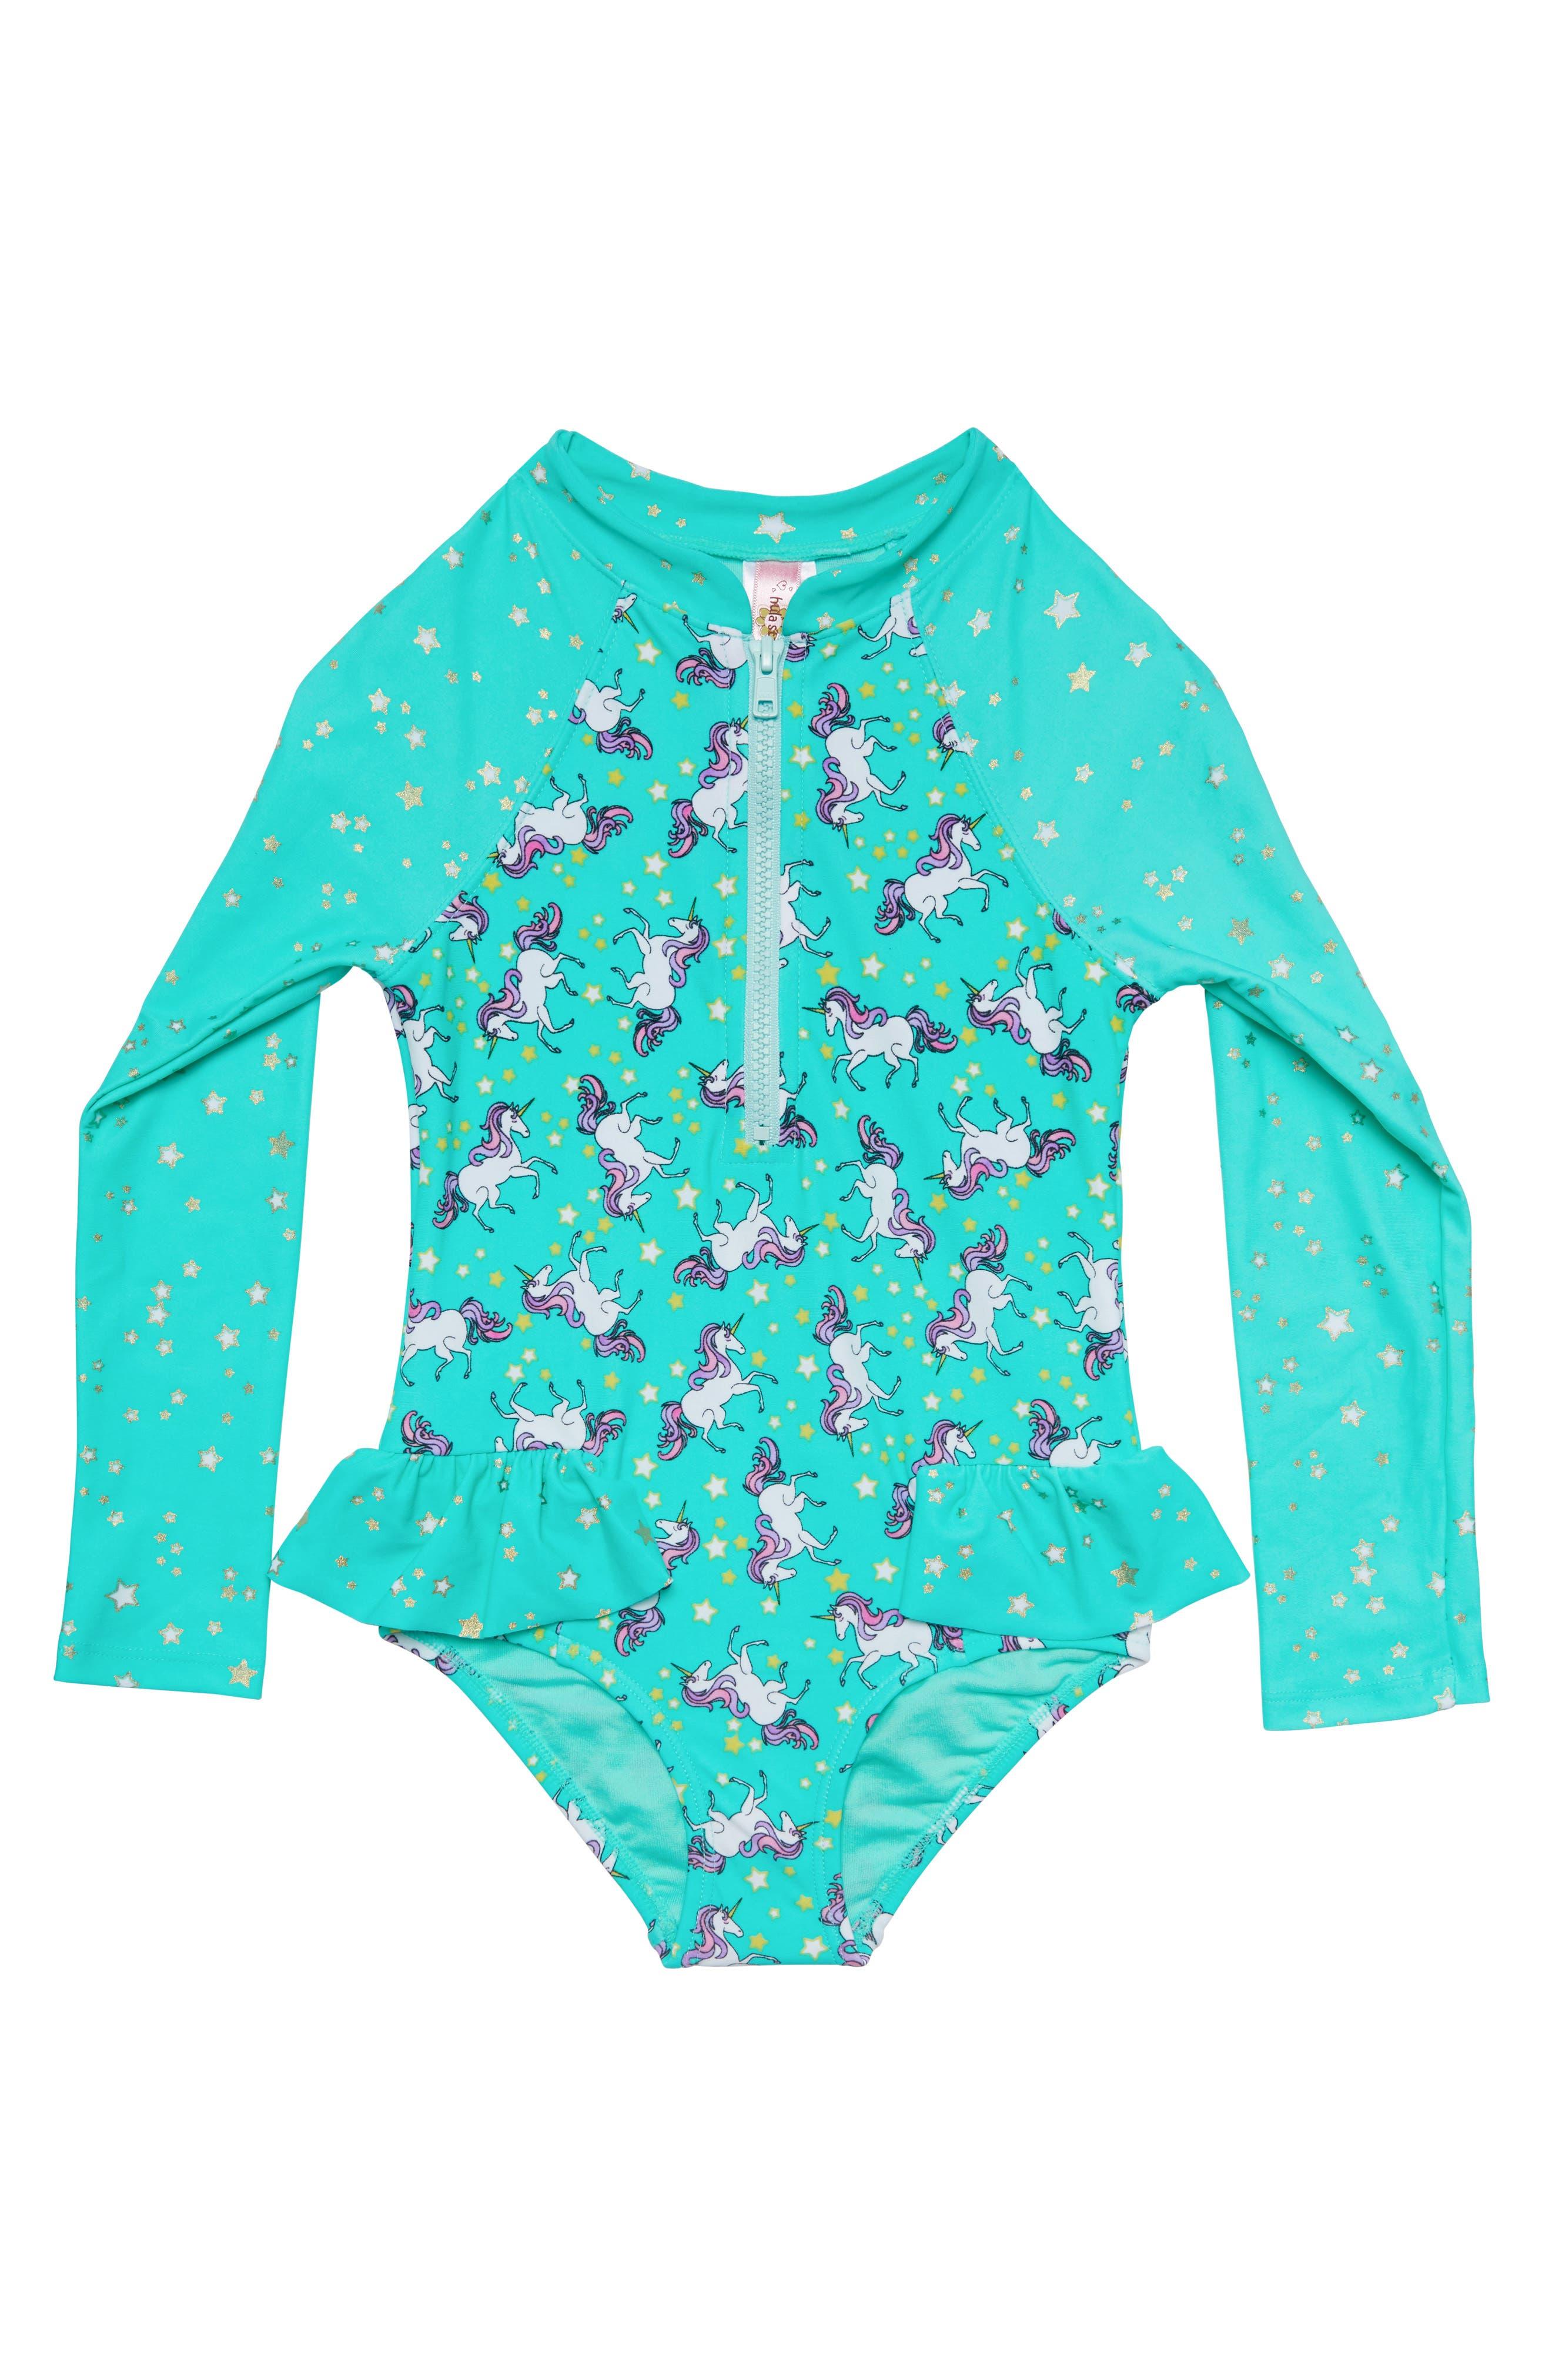 Stardust Dream One-Piece Rashguard Swimsuit,                             Main thumbnail 1, color,                             MERMAID BLUE